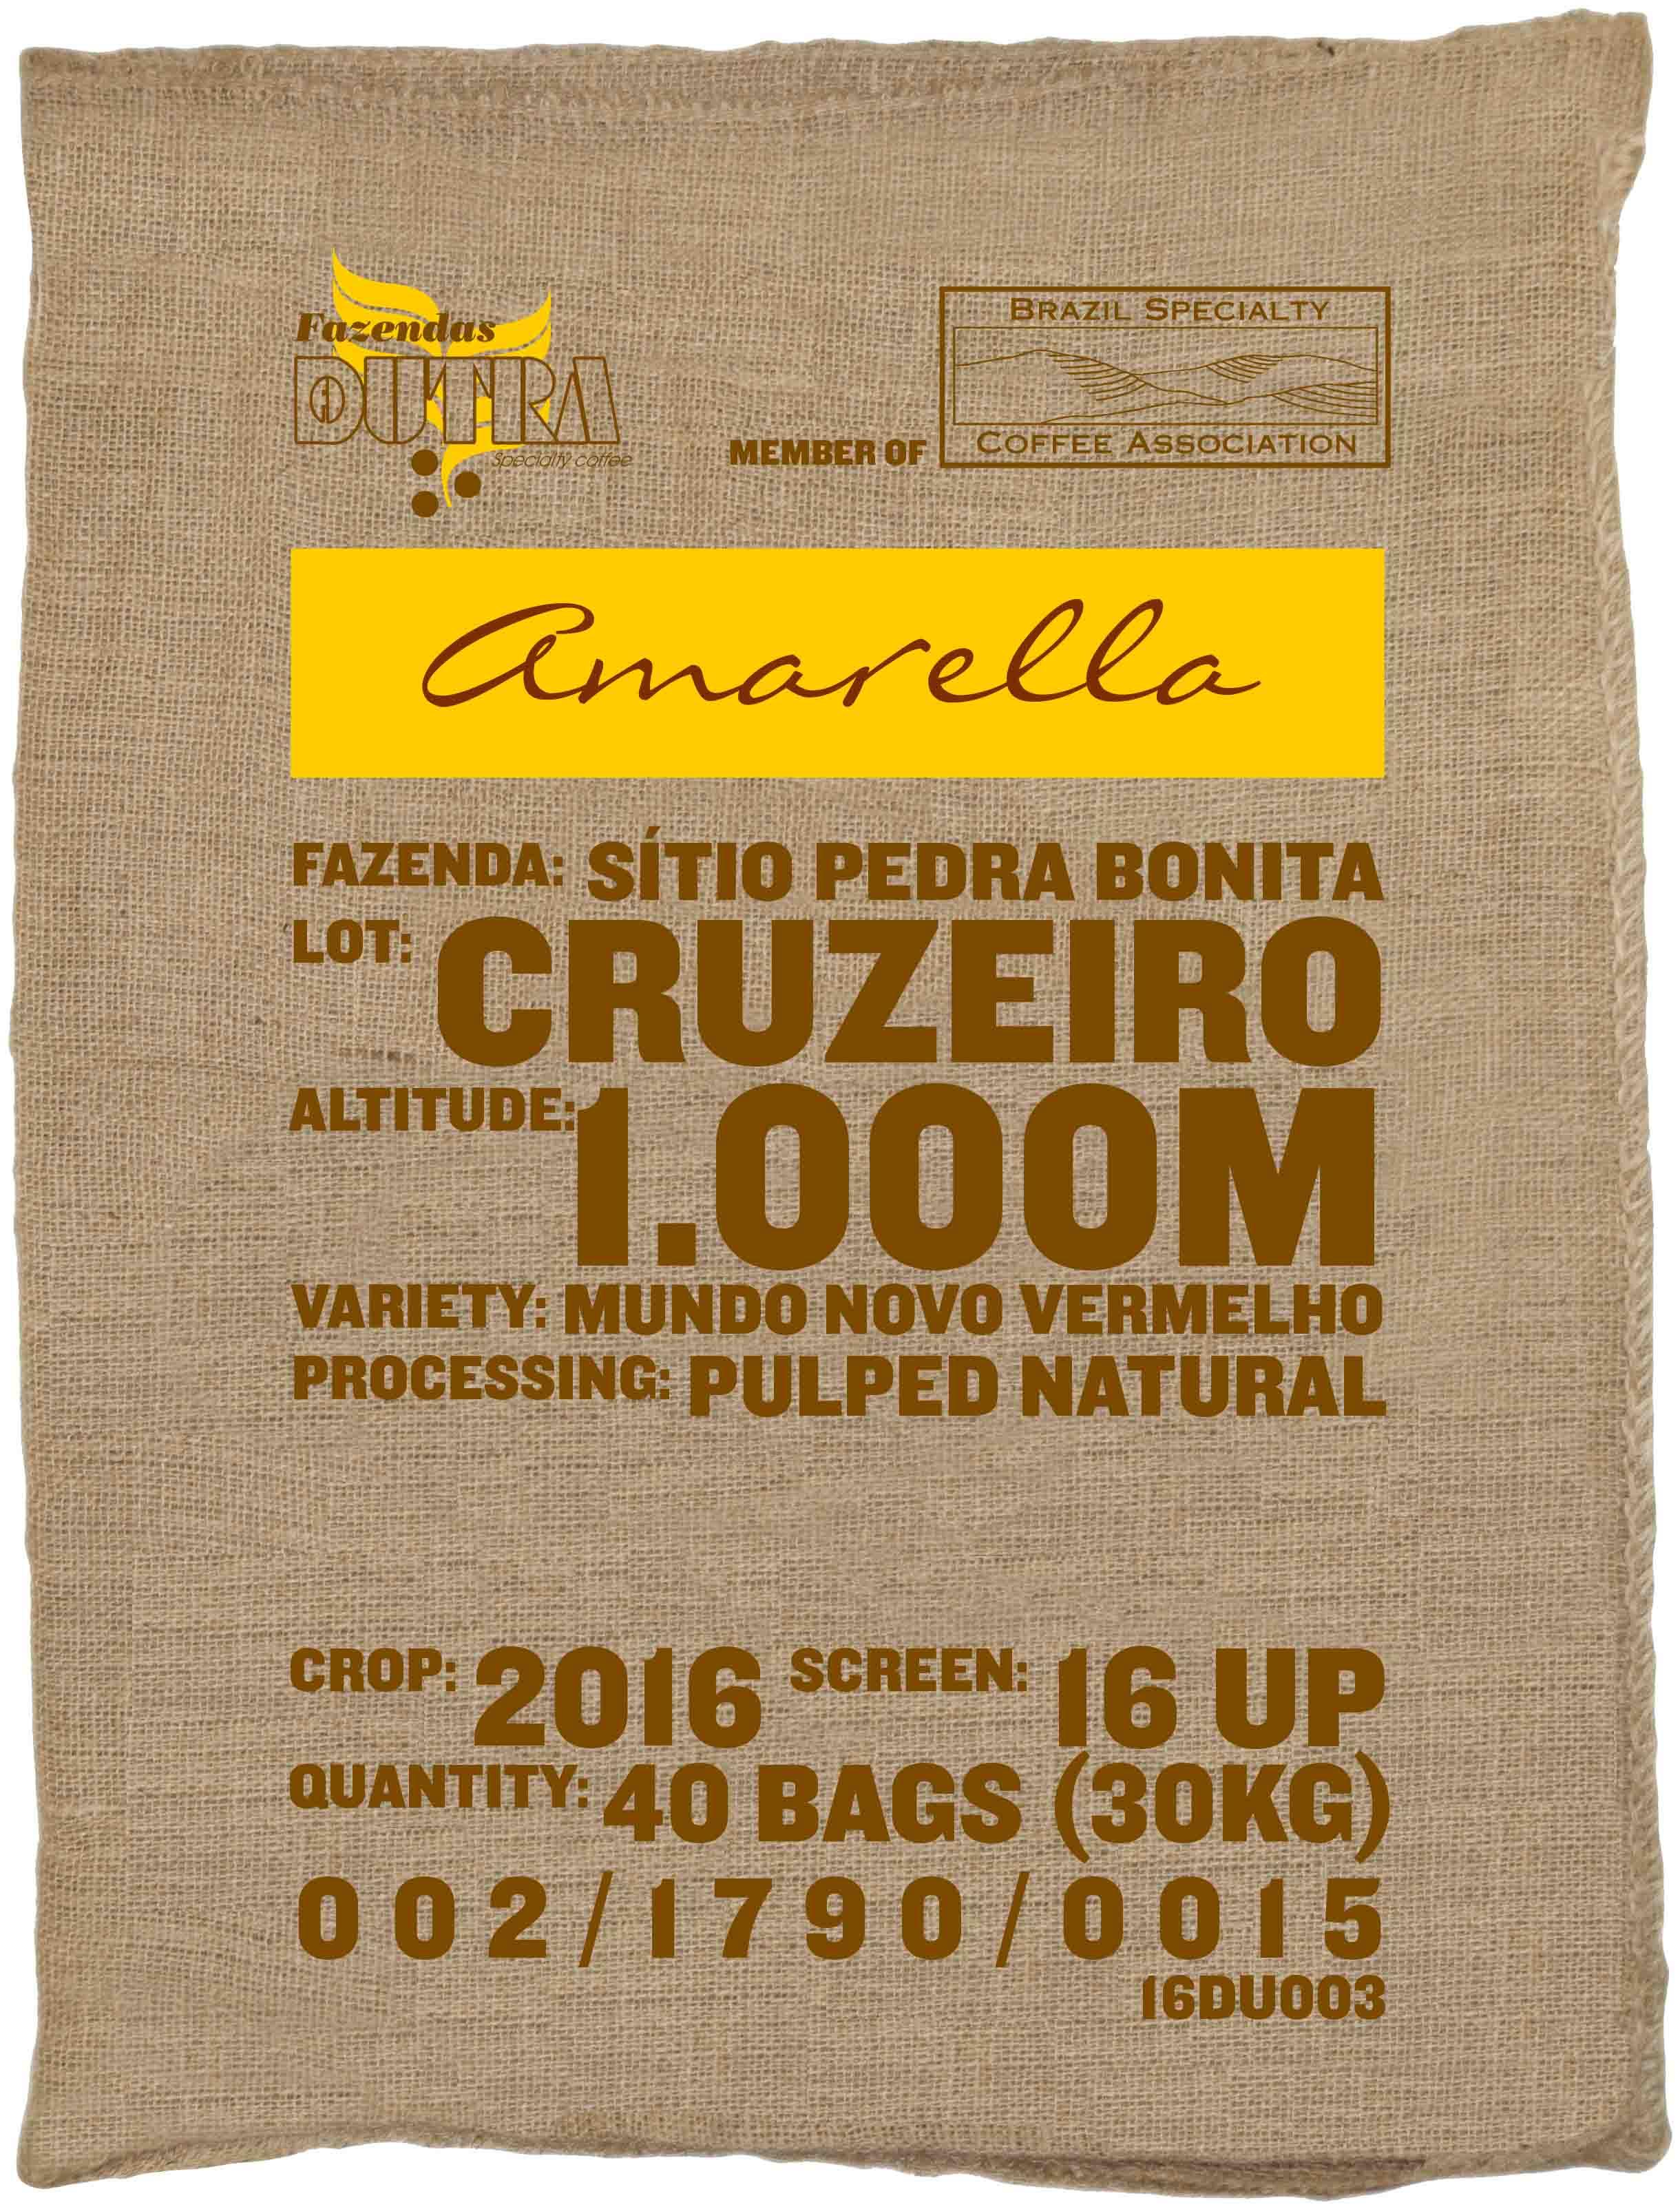 Ein Rohkaffeesack amarella Parzellenkaffe Varietät Mundo Novo vermelho. Fazendas Dutra Lot Cruzeiro.